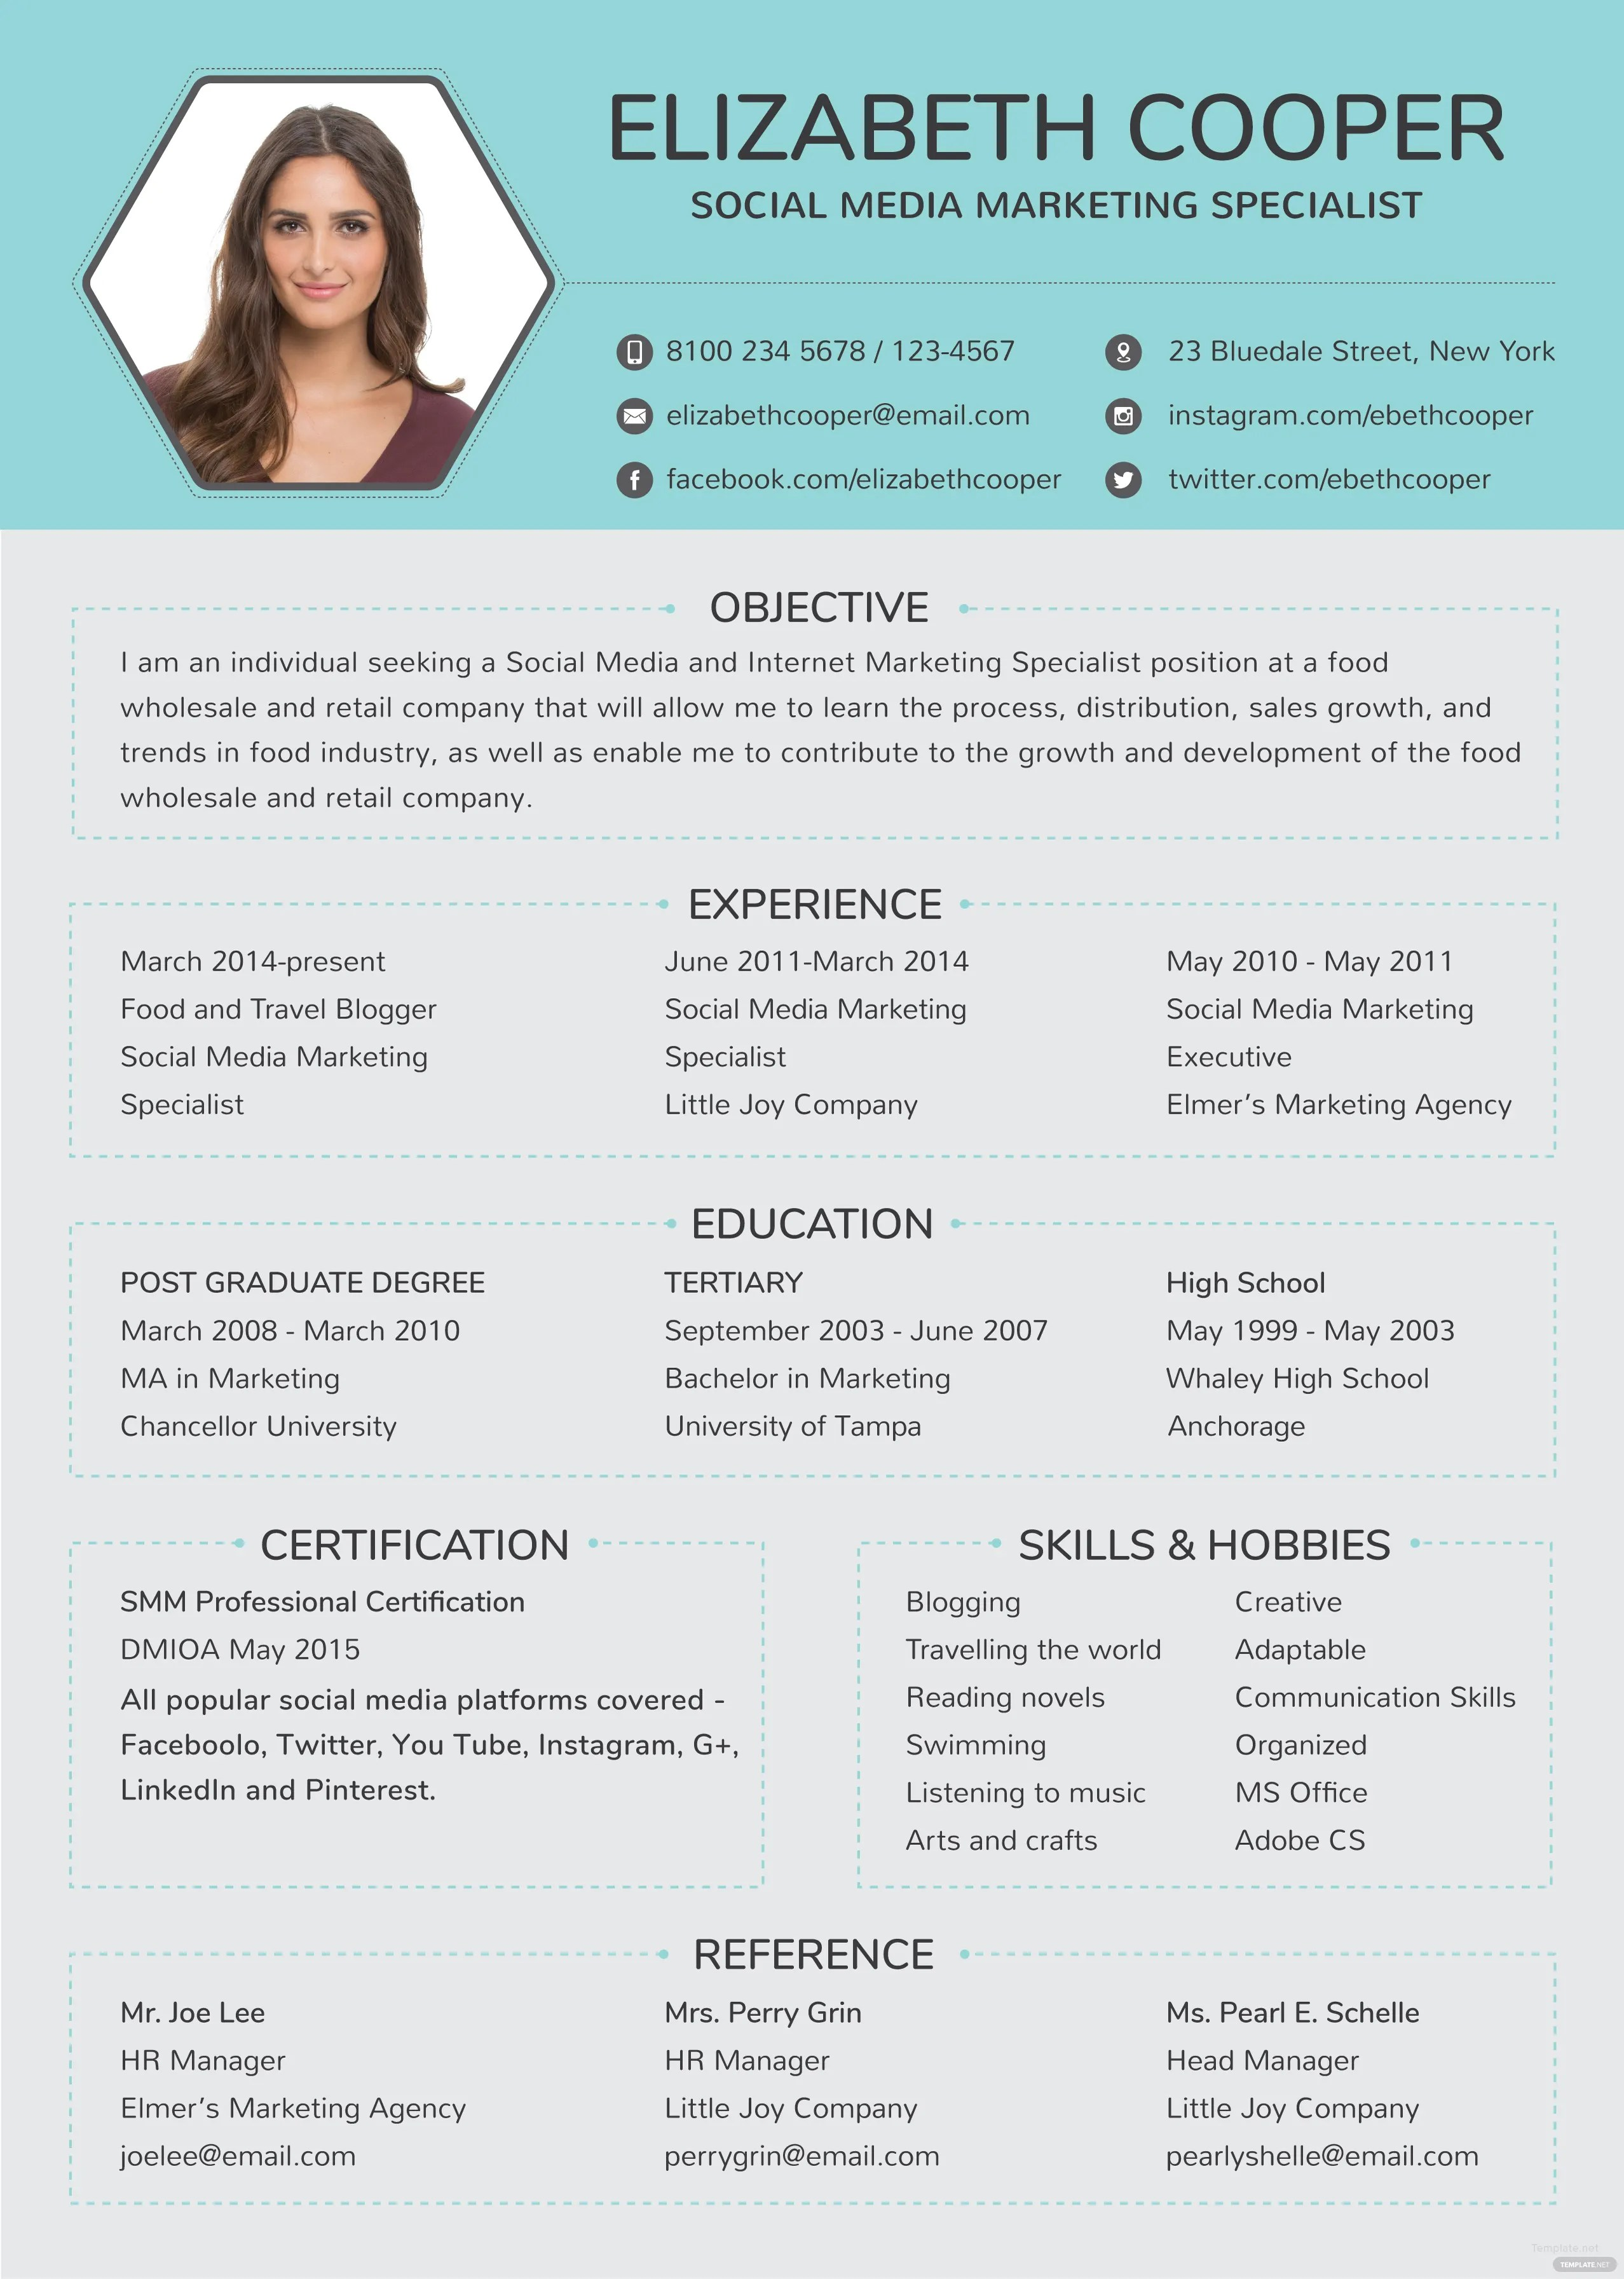 Free Social Media Specialist Resume Template in Adobe